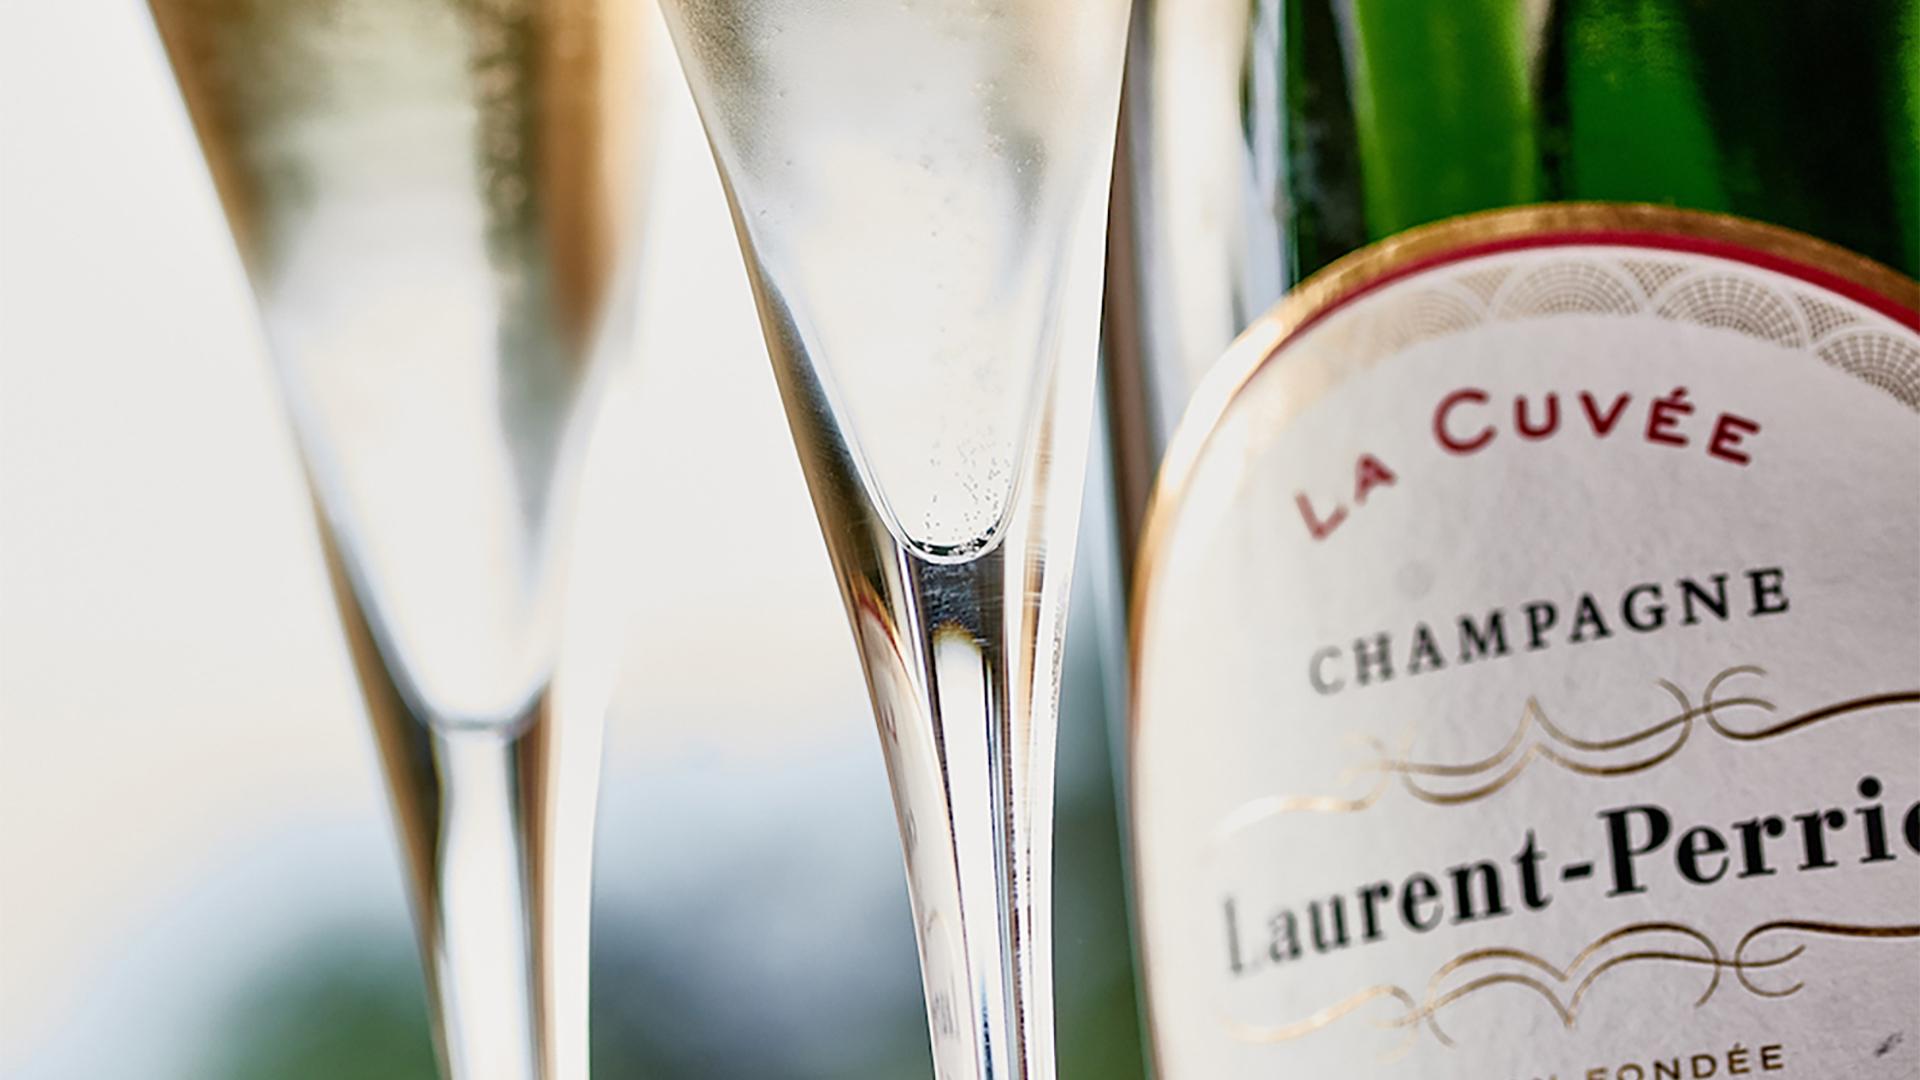 LP5 (Laurent-Perrier).jpg